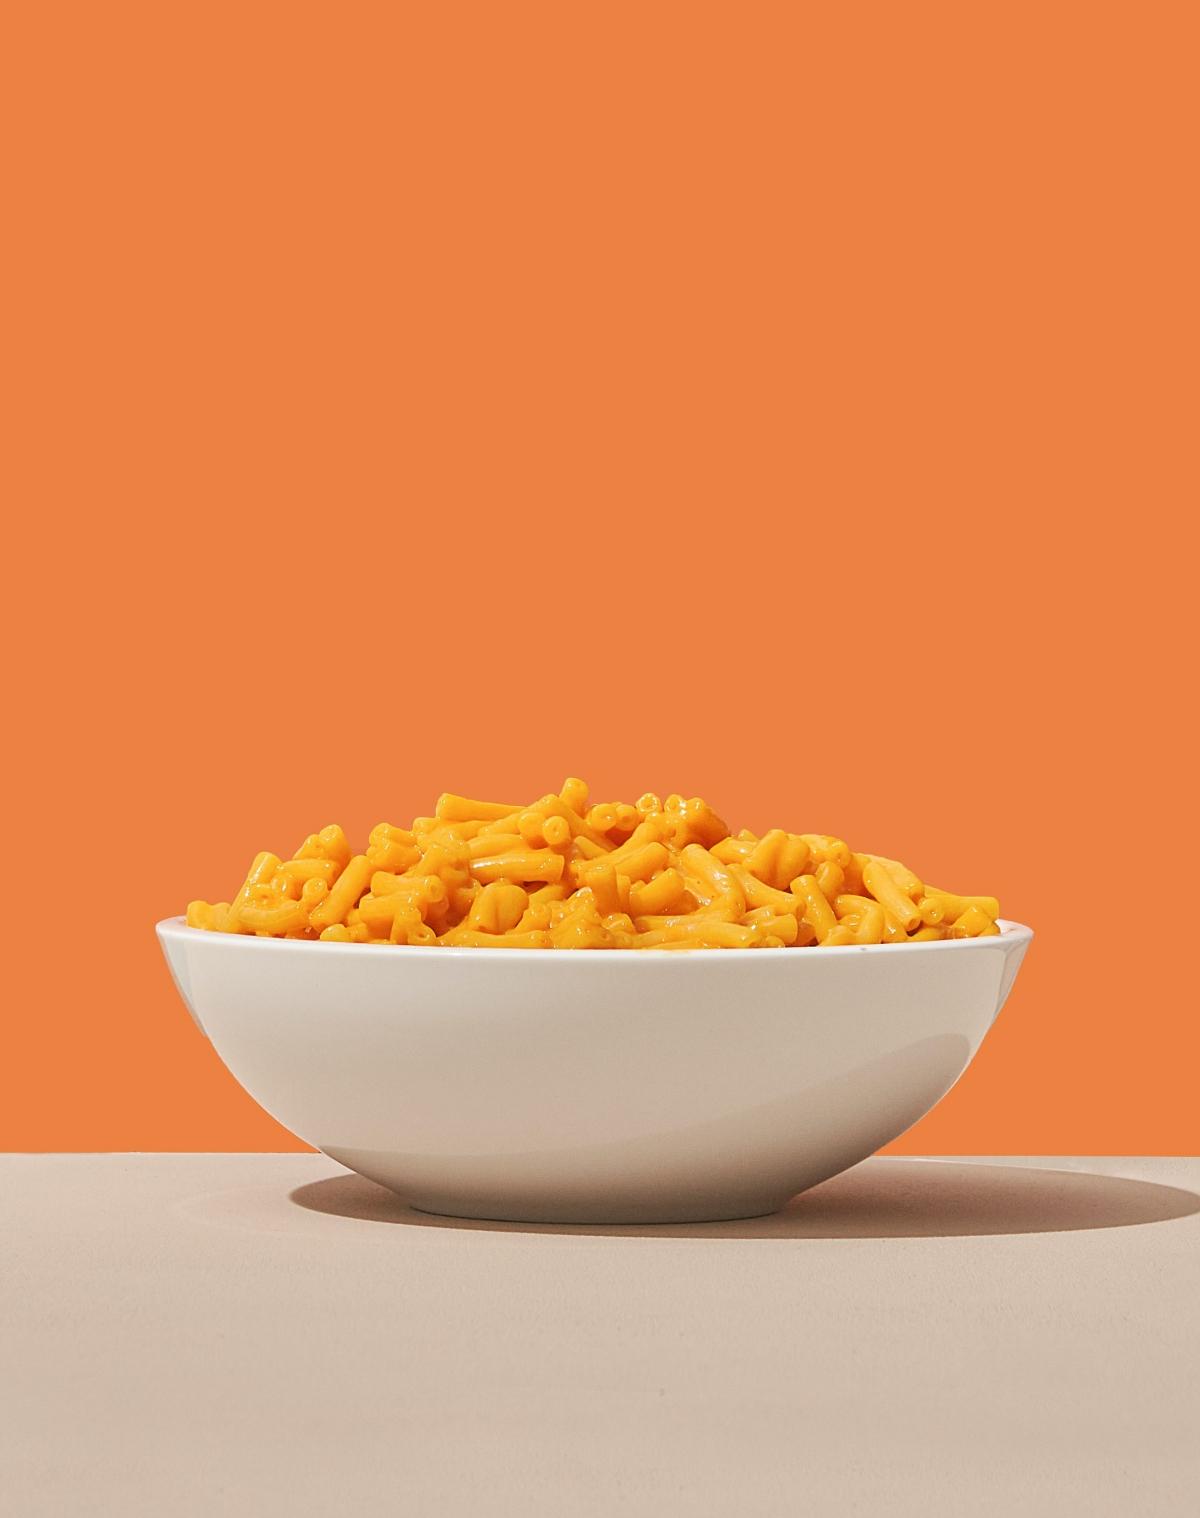 mac and cheese on orange background